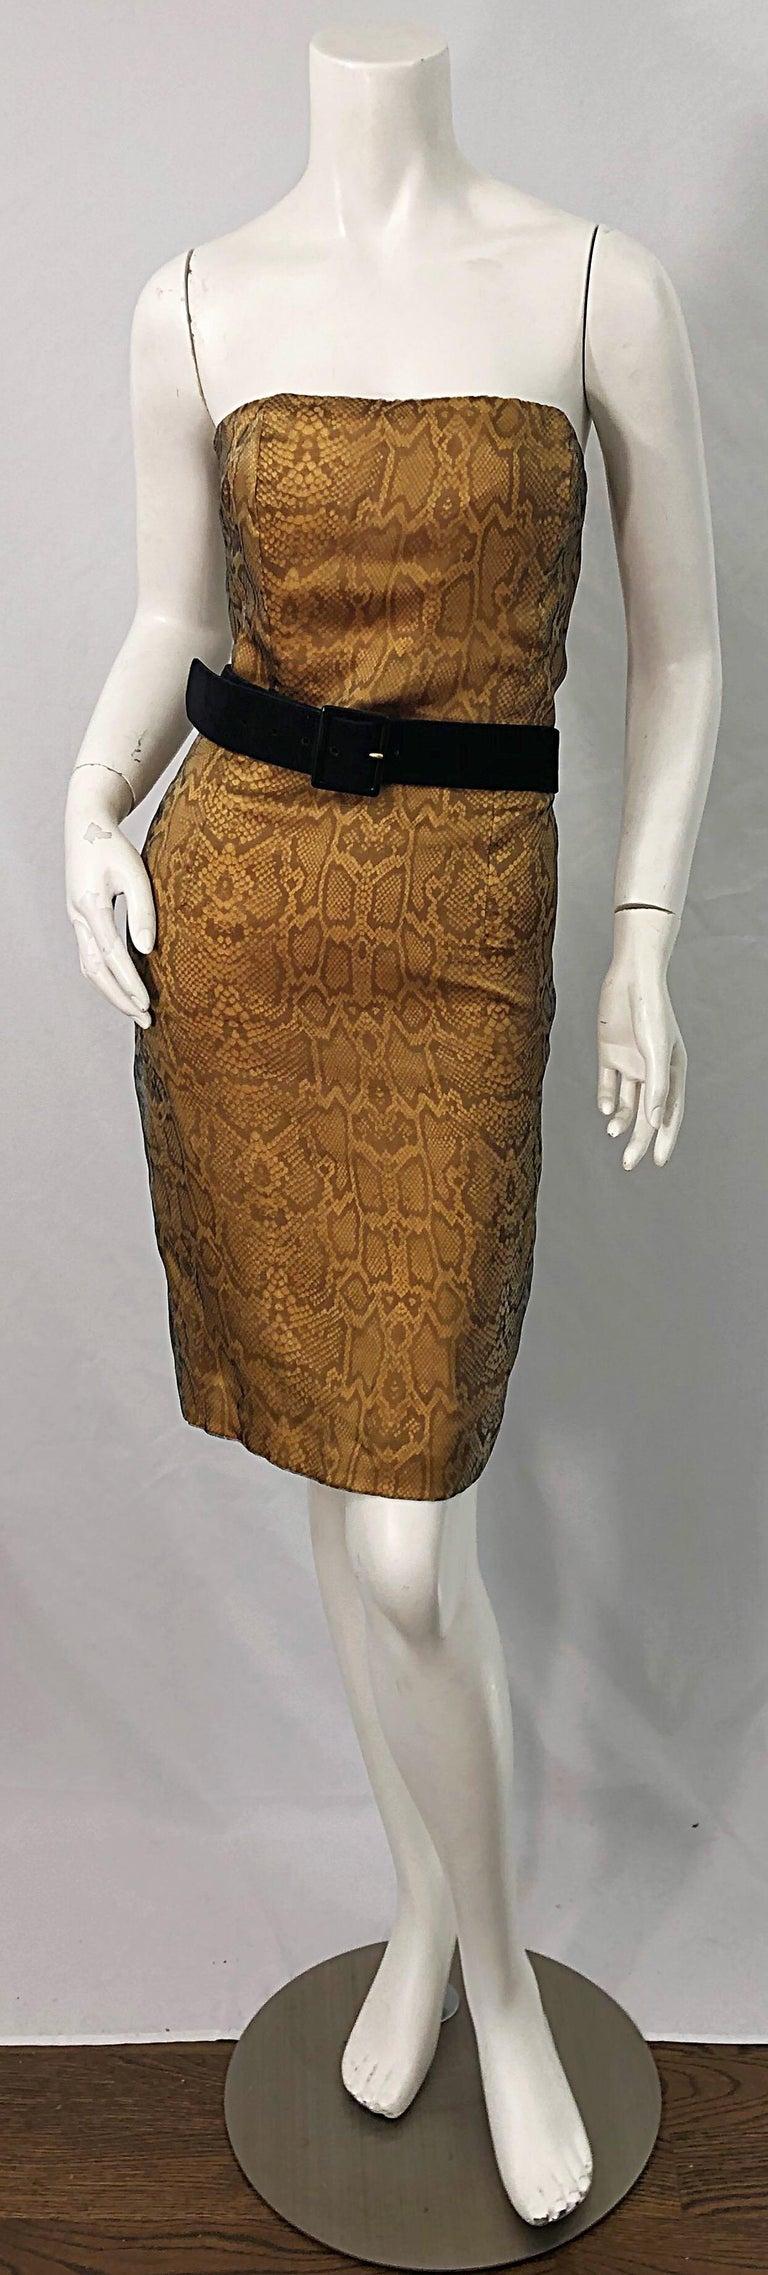 1990s Luca Luca Size 42 / 6 Snakeskin Silk Organza Strapless 90s Tan Brown Dress For Sale 2